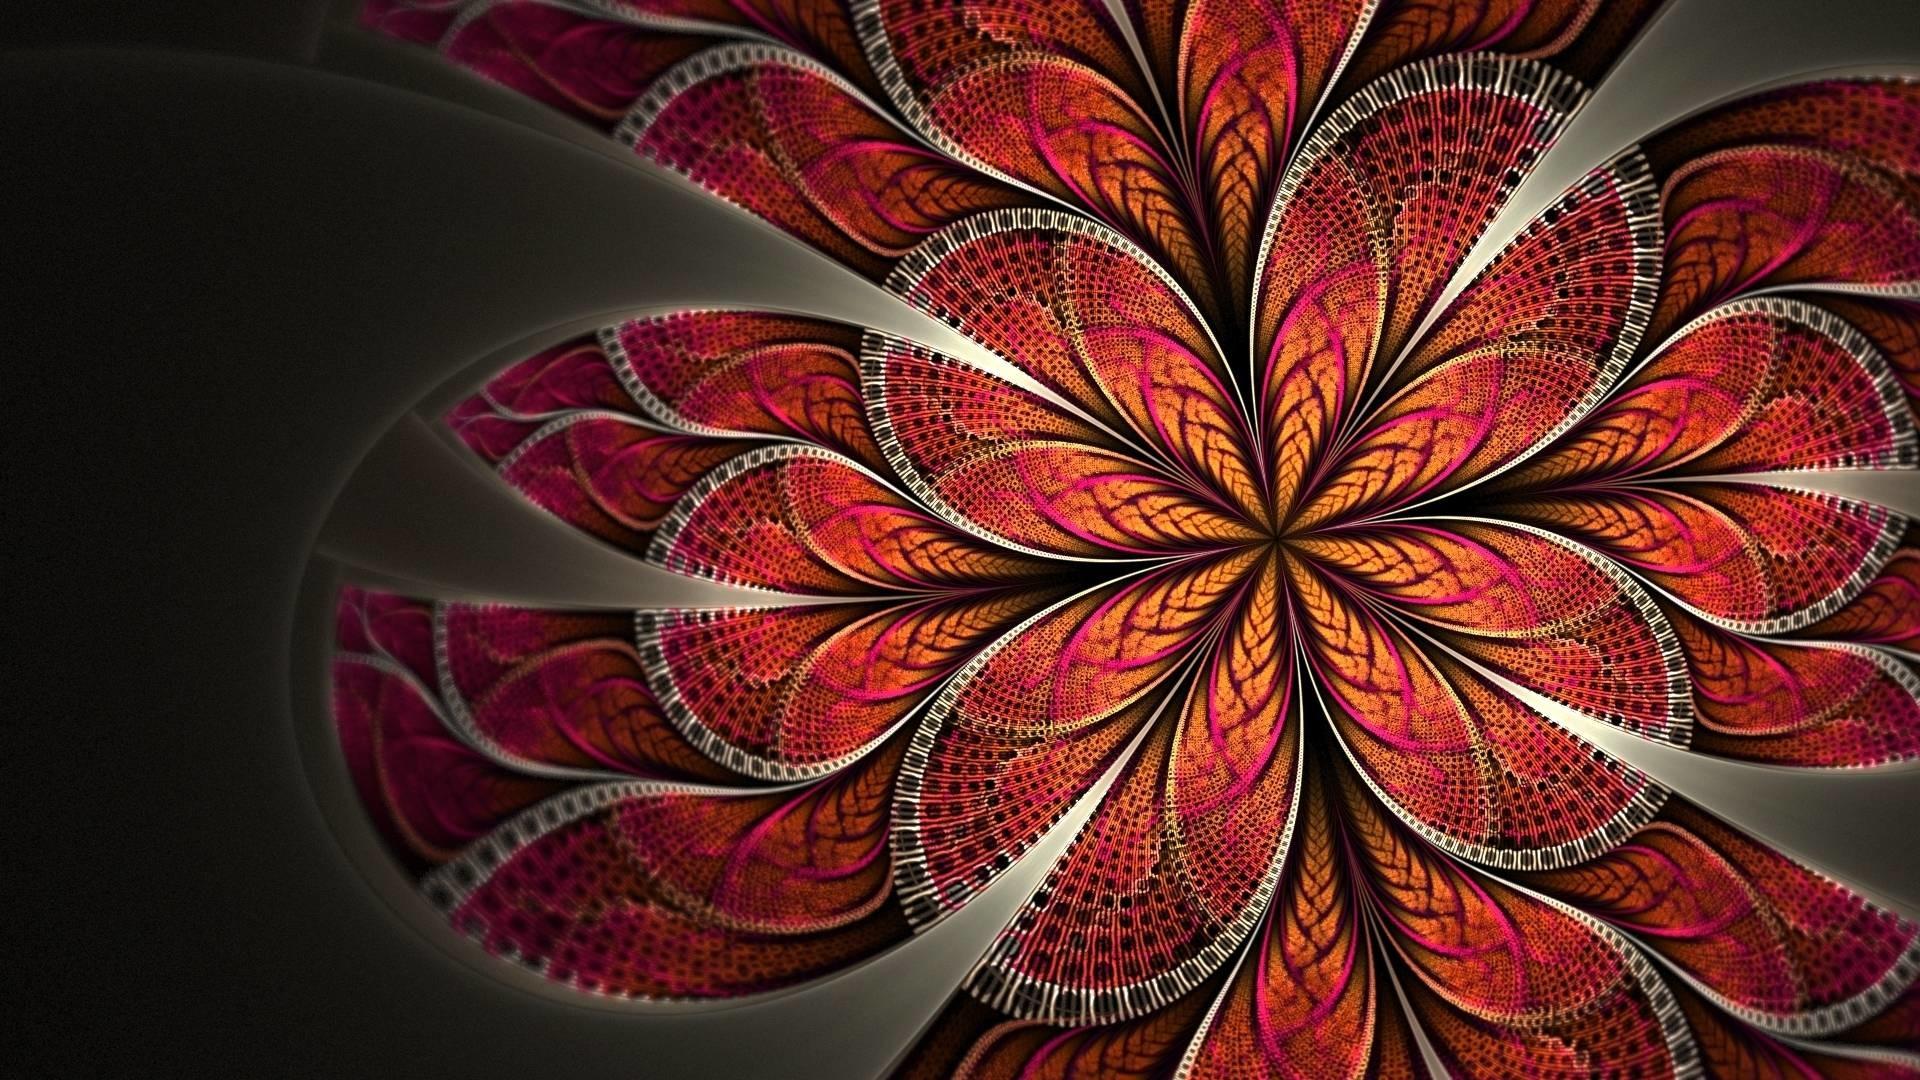 Abstract 1080p Desktop Wallpaper